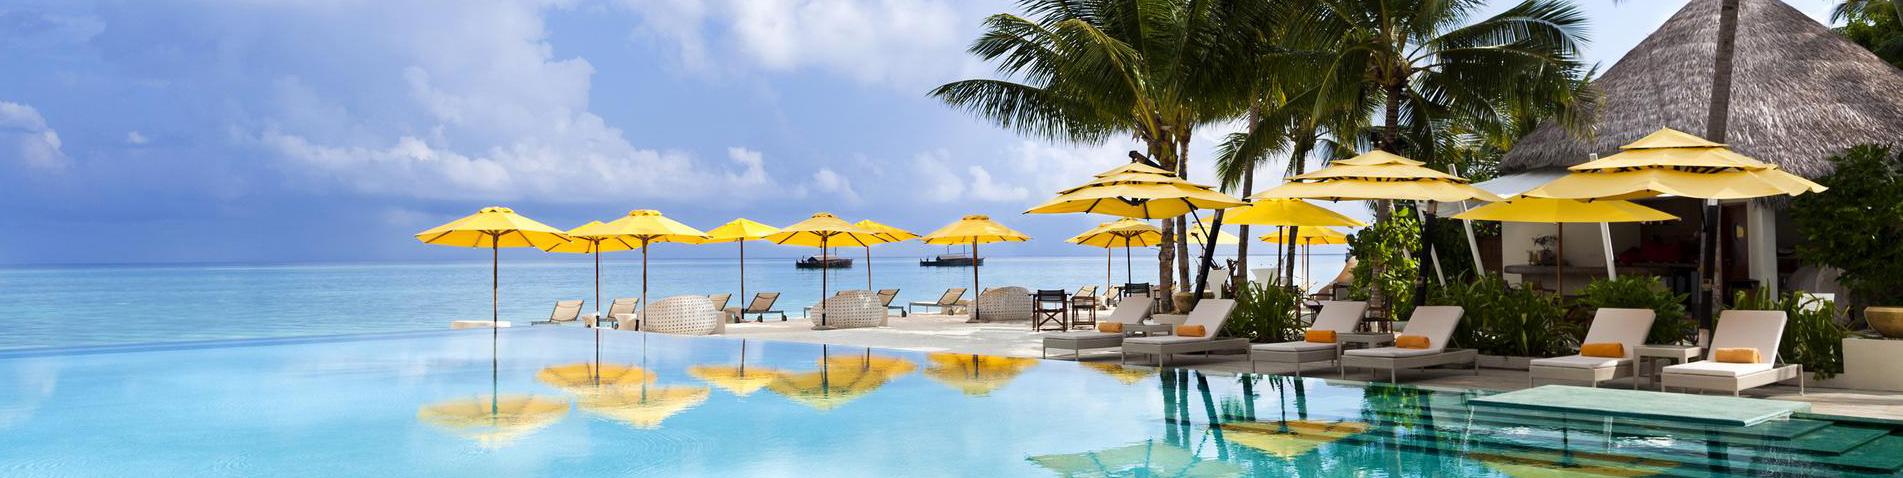 Summer in Maldives